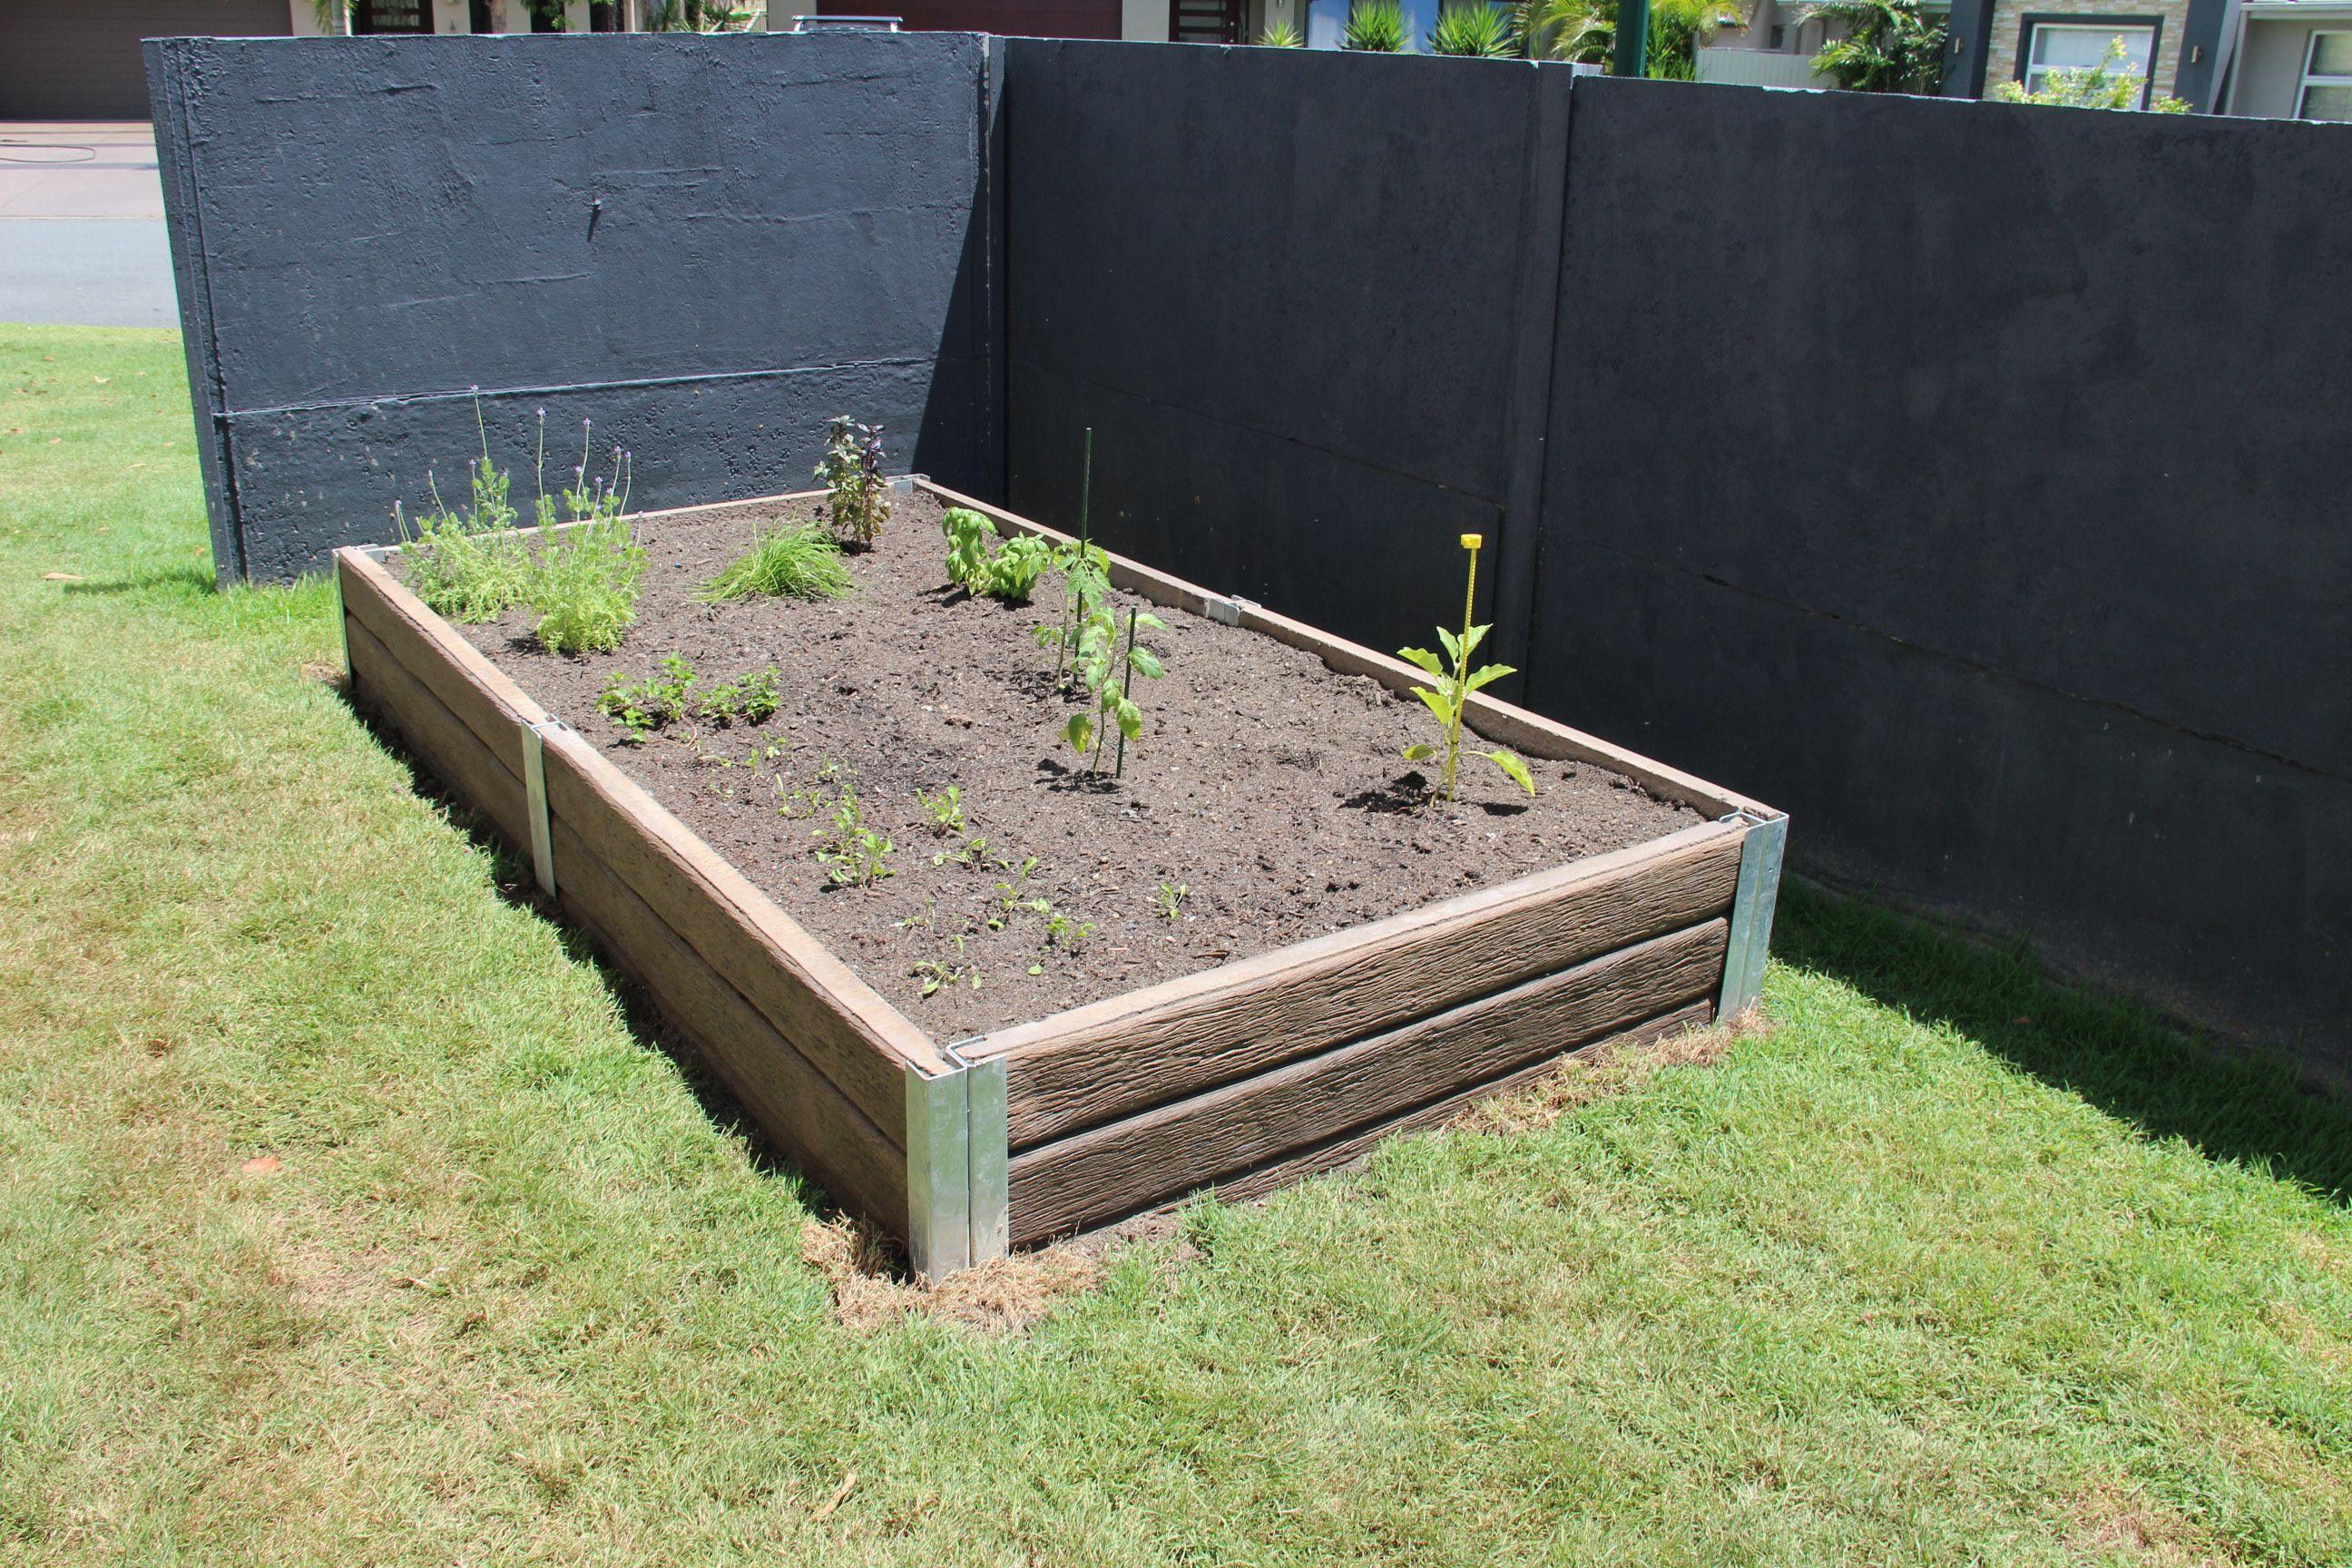 Ridgi Ironbark Concrete Sleepers Steel Posts Used To Create A Veggie Patch For More Information Concrete Sleeper Retaining Walls Backyard Concrete Sleepers